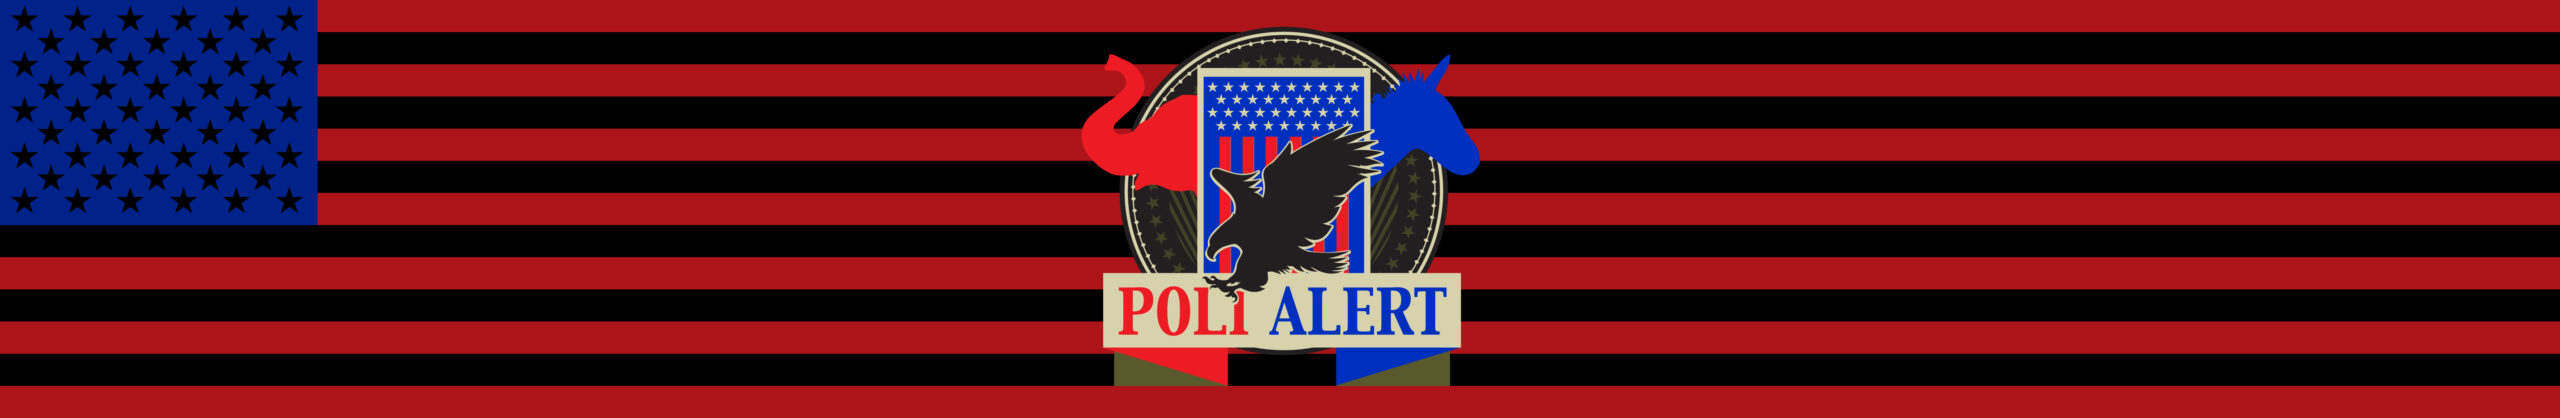 Poli Alert